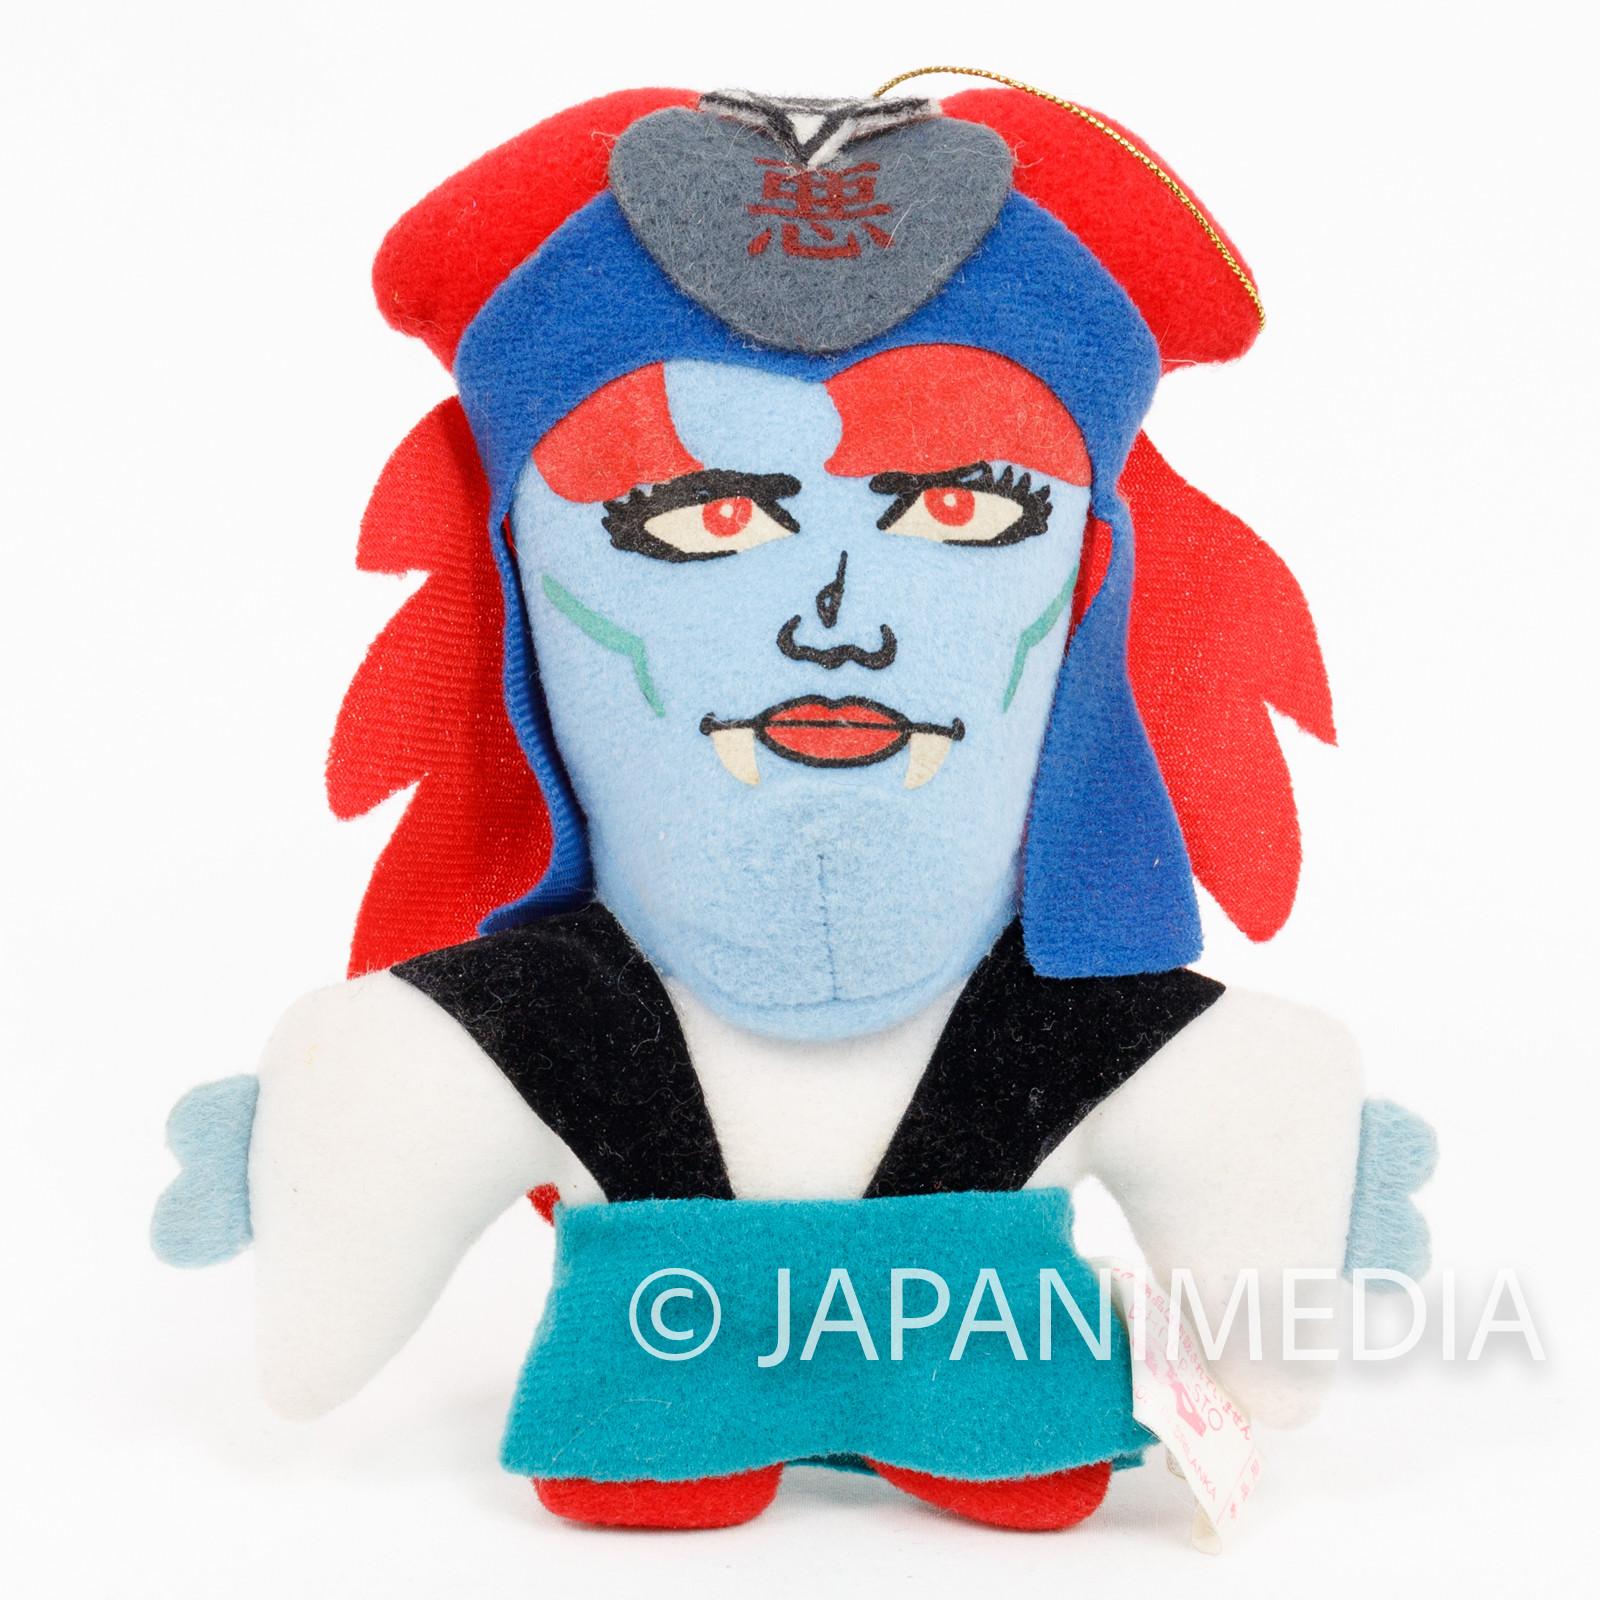 Retro RARE! Bikkuriman Super Devil Plush Doll Banpresto 1993 JAPAN ANIME MANGA